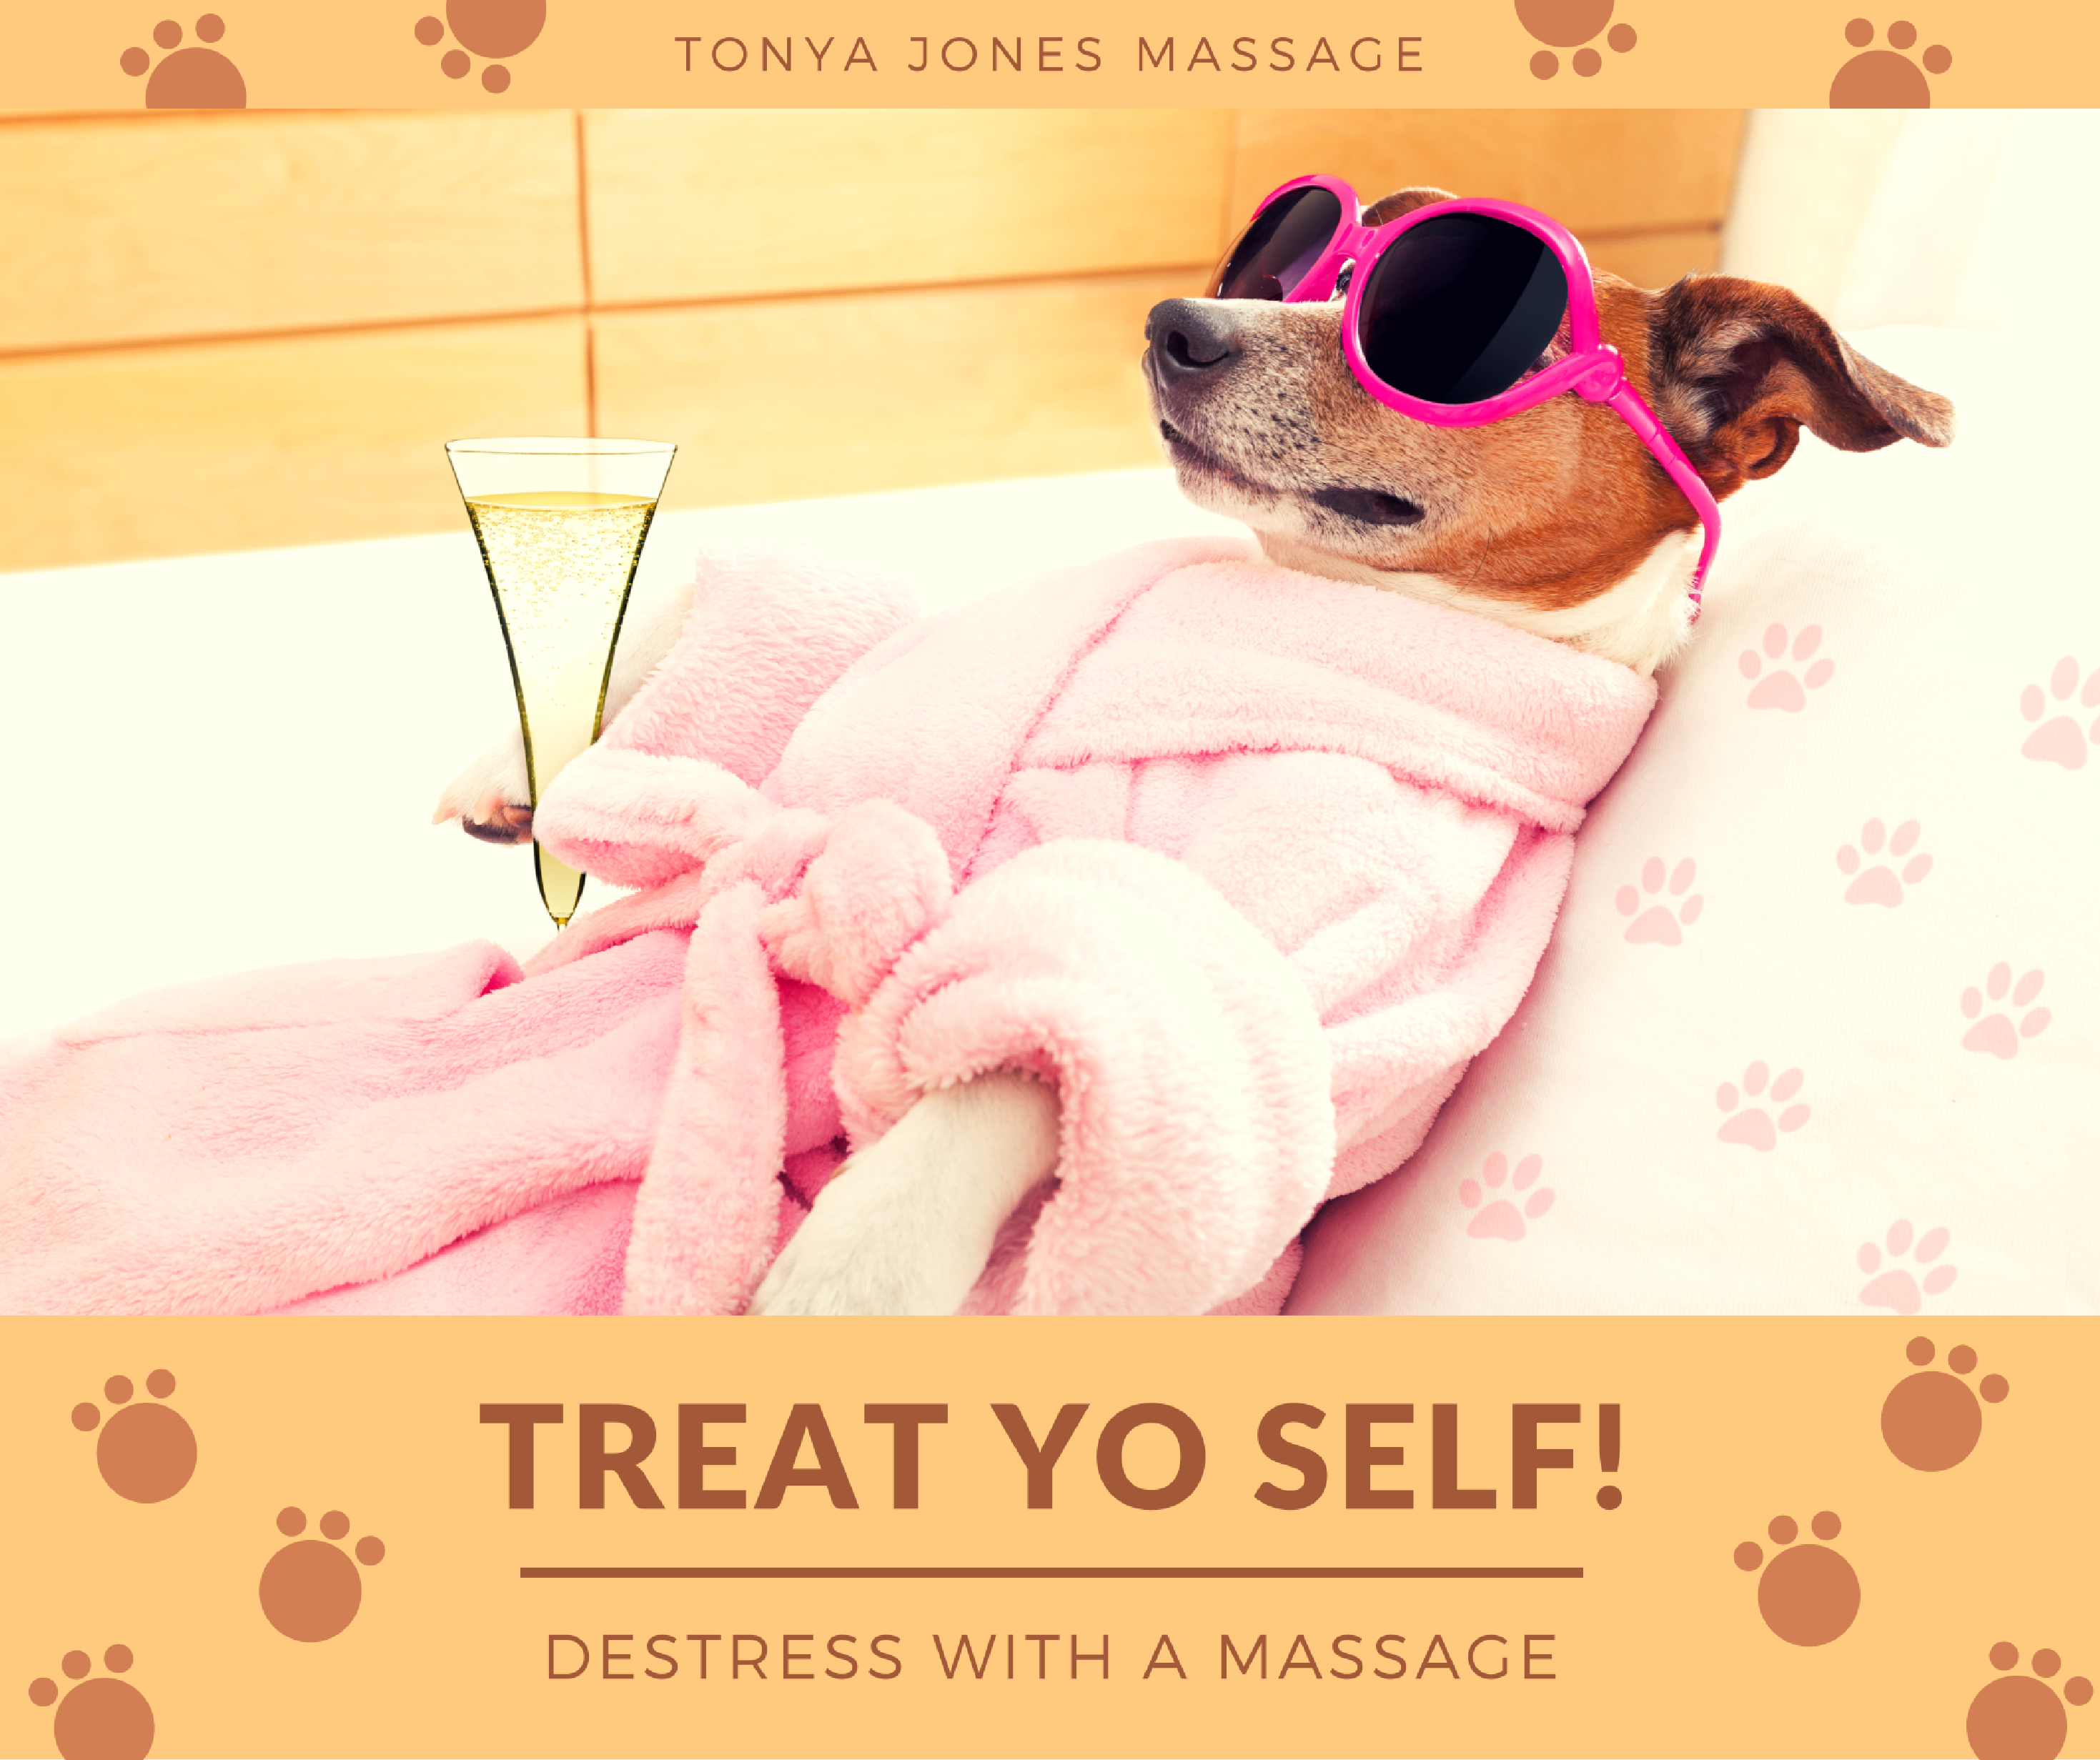 TOnya jones massage